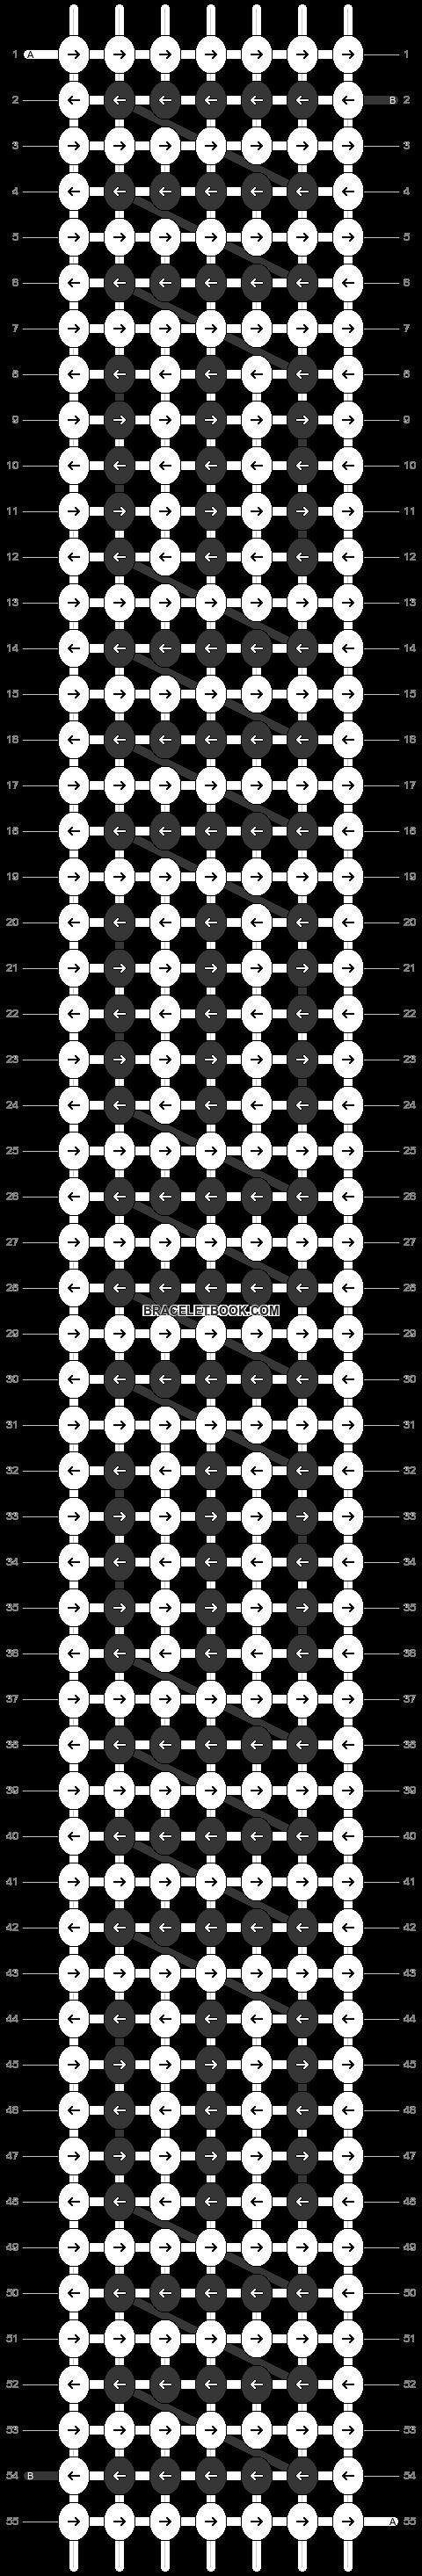 Alpha pattern #26147 pattern